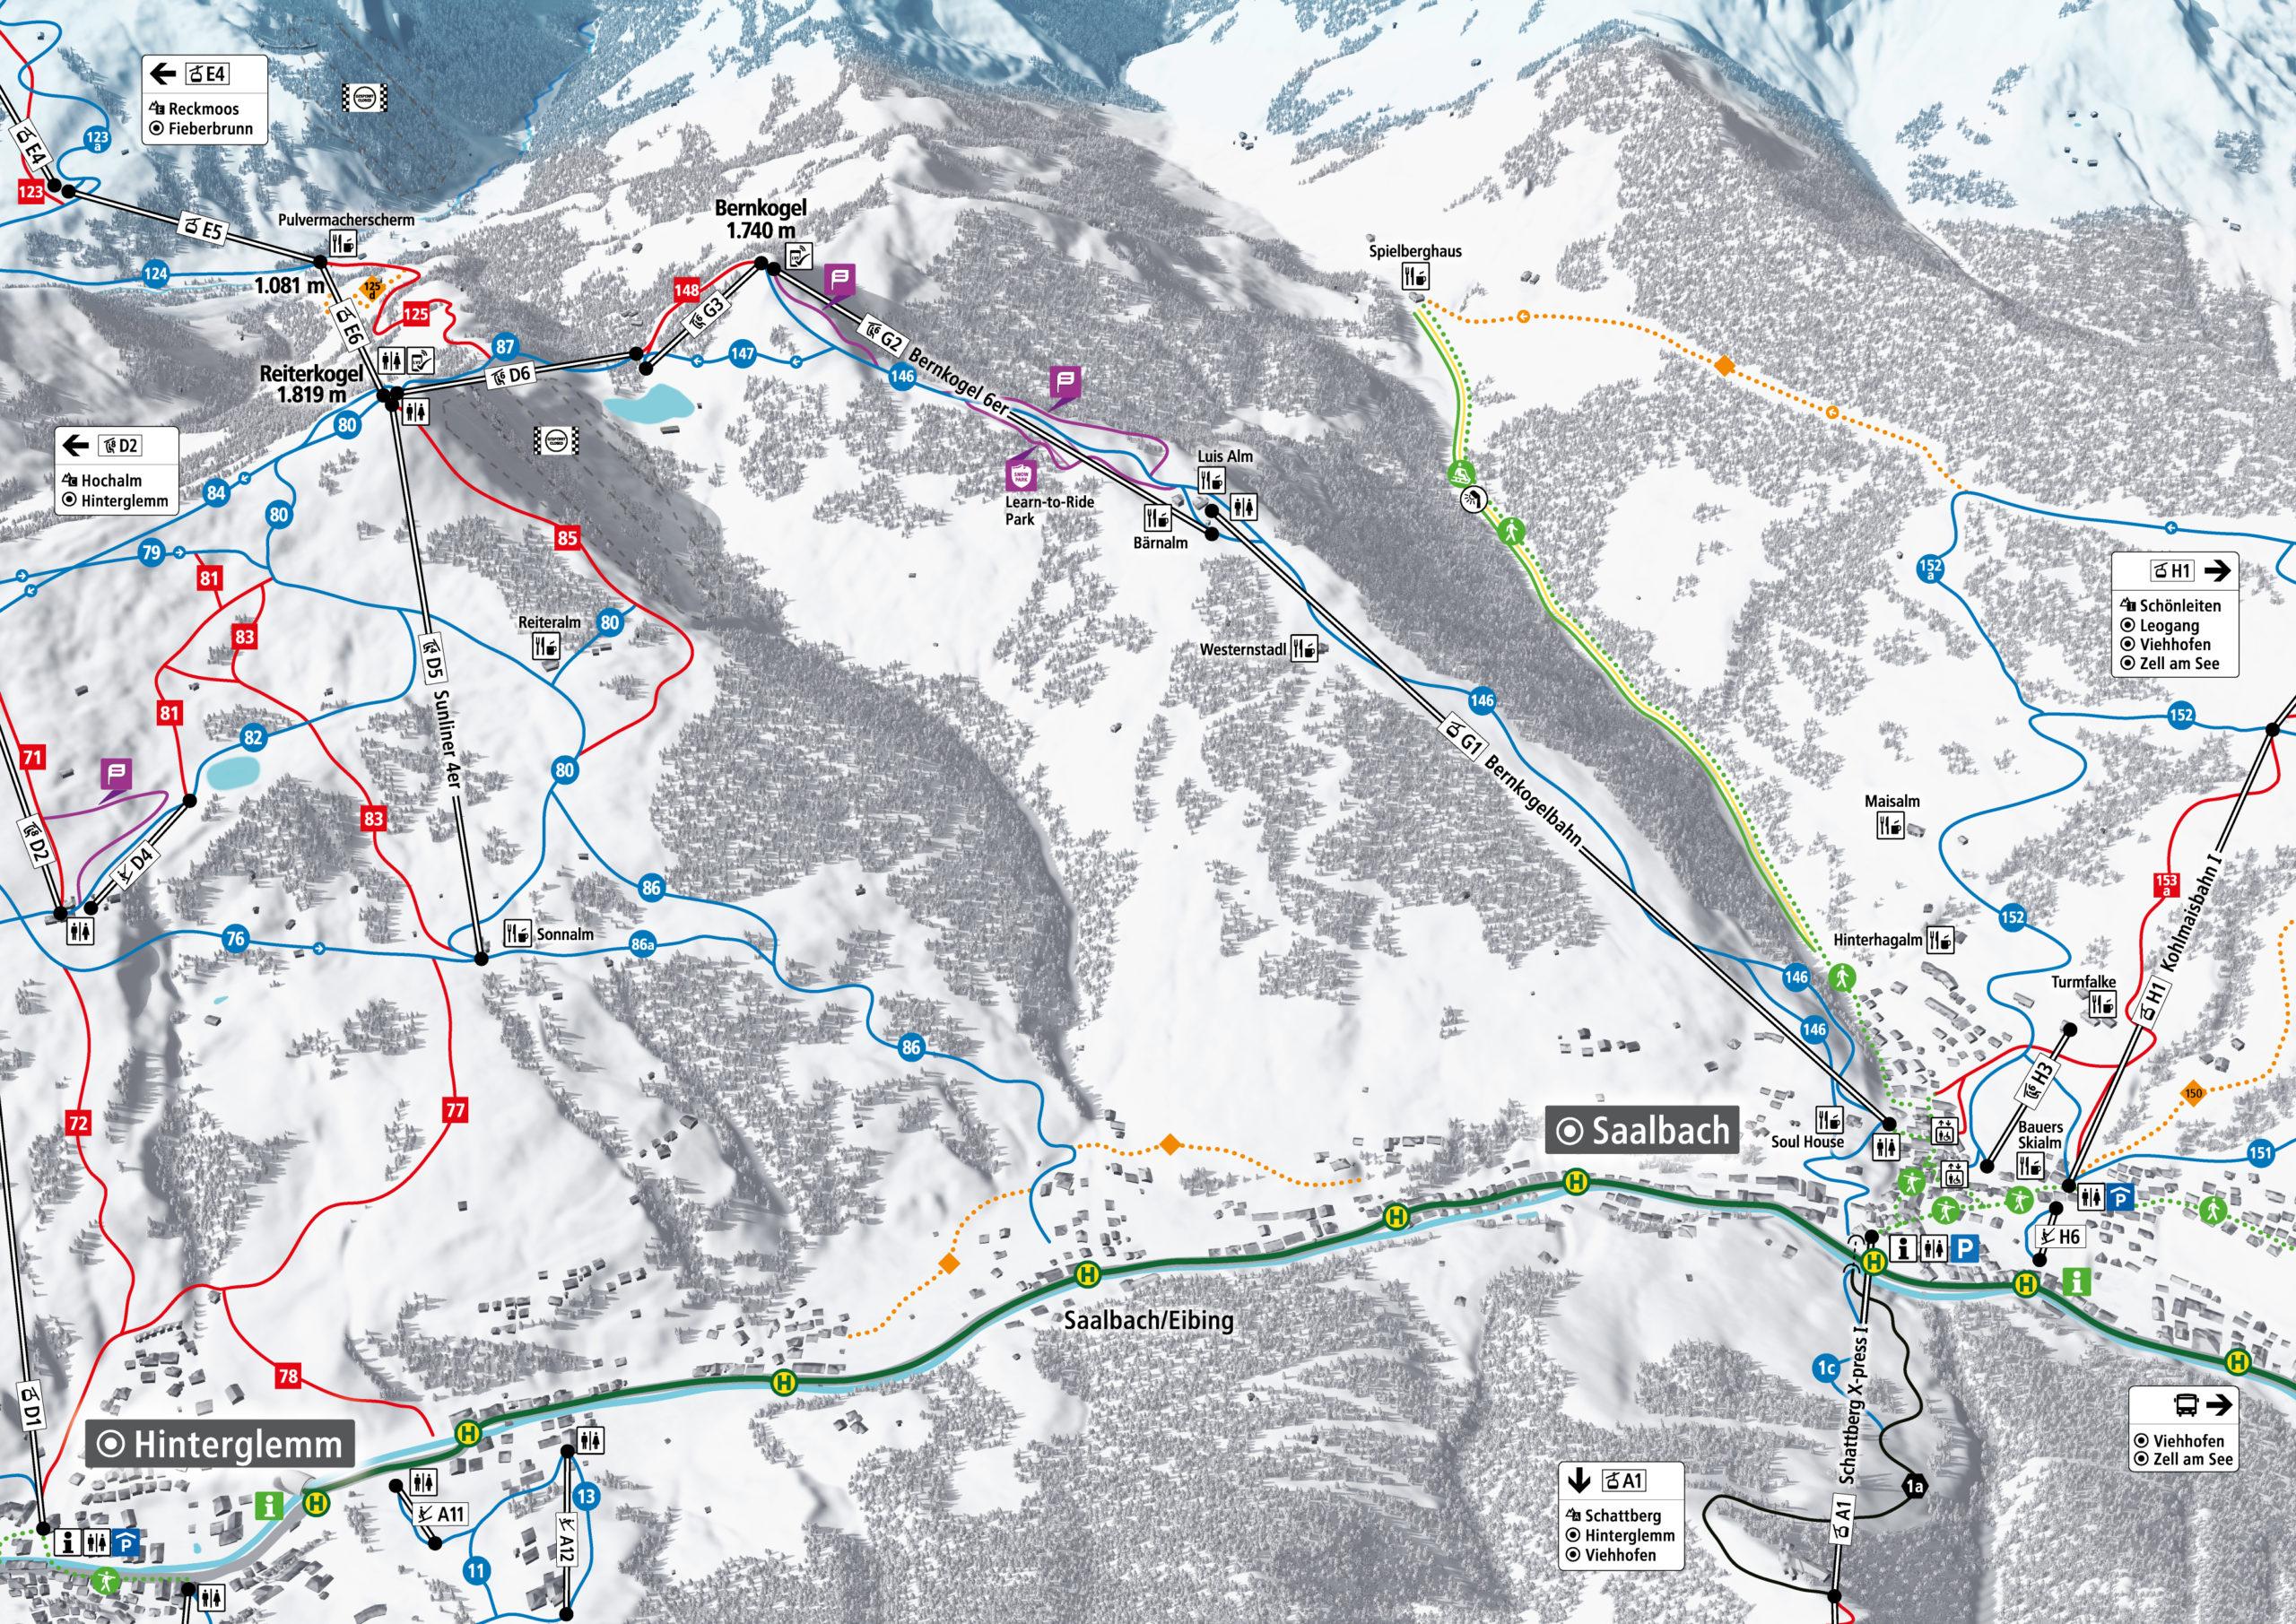 3D Pistenplan und Panoramakarte Skicircus Saalbach Hinterglemm Leogang Fieberbrunn Zone G Bernkogel